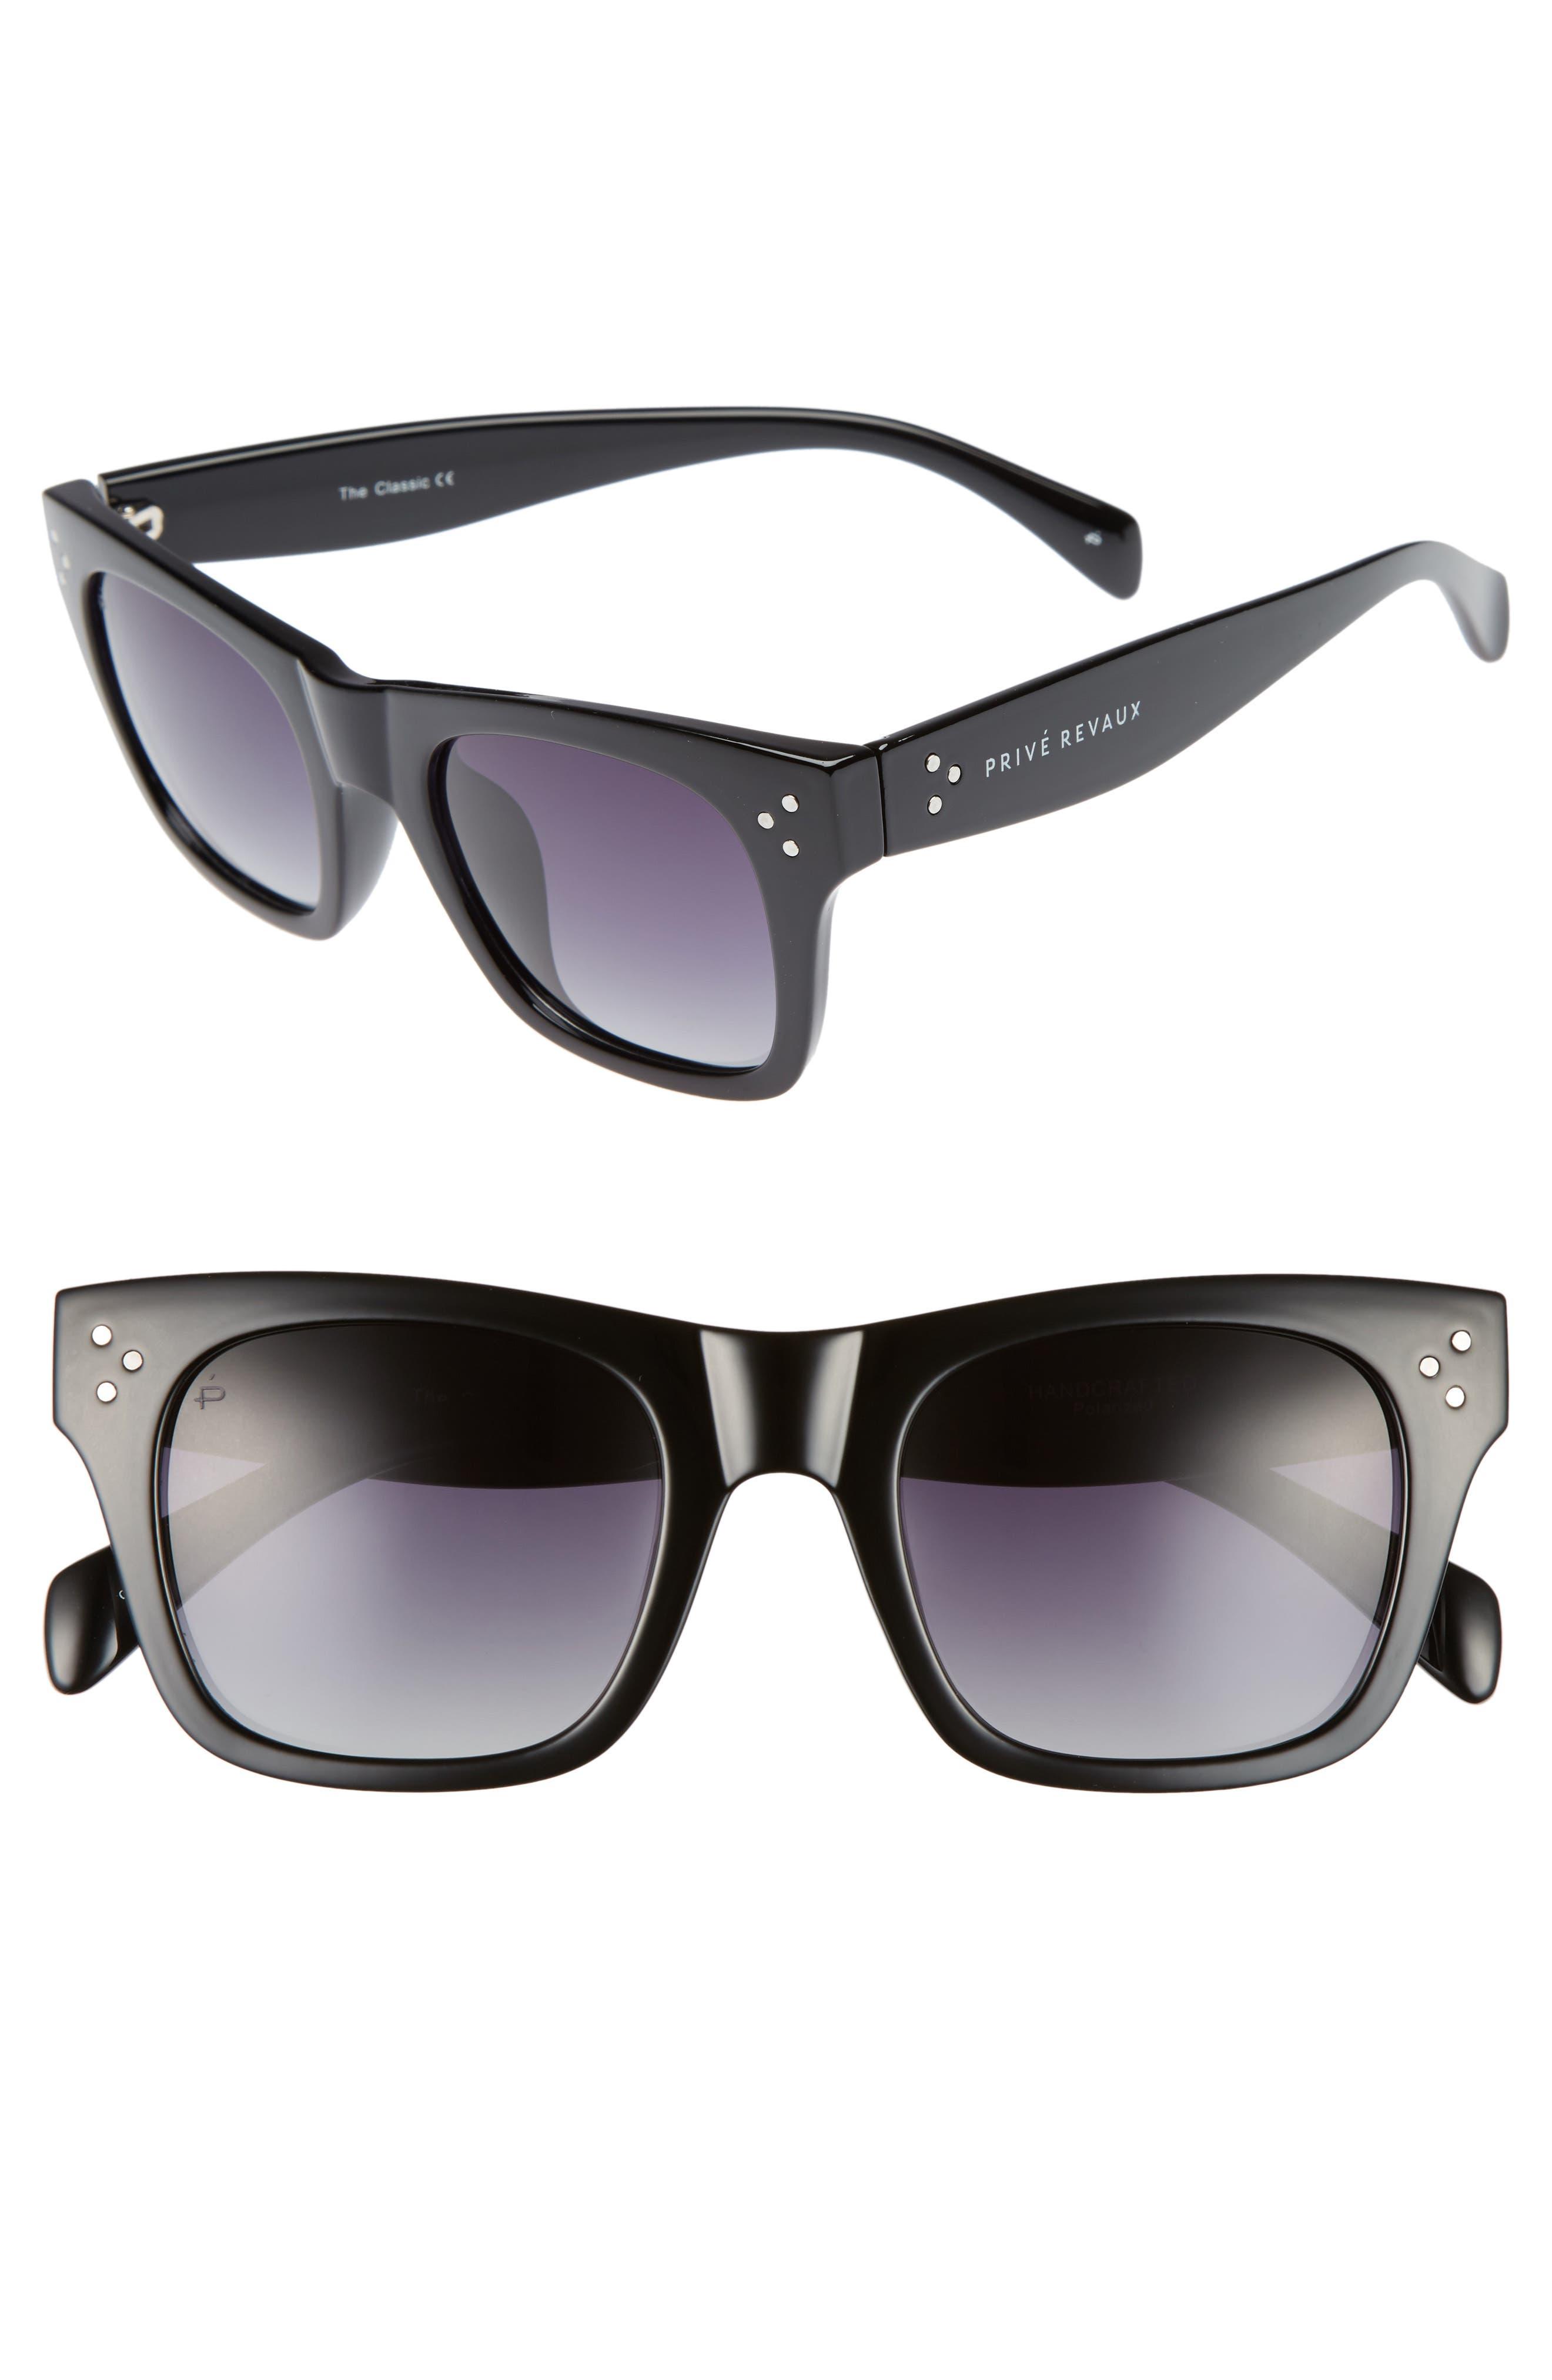 Privé Revaux The Classic 51mm Polarized Square Sunglasses